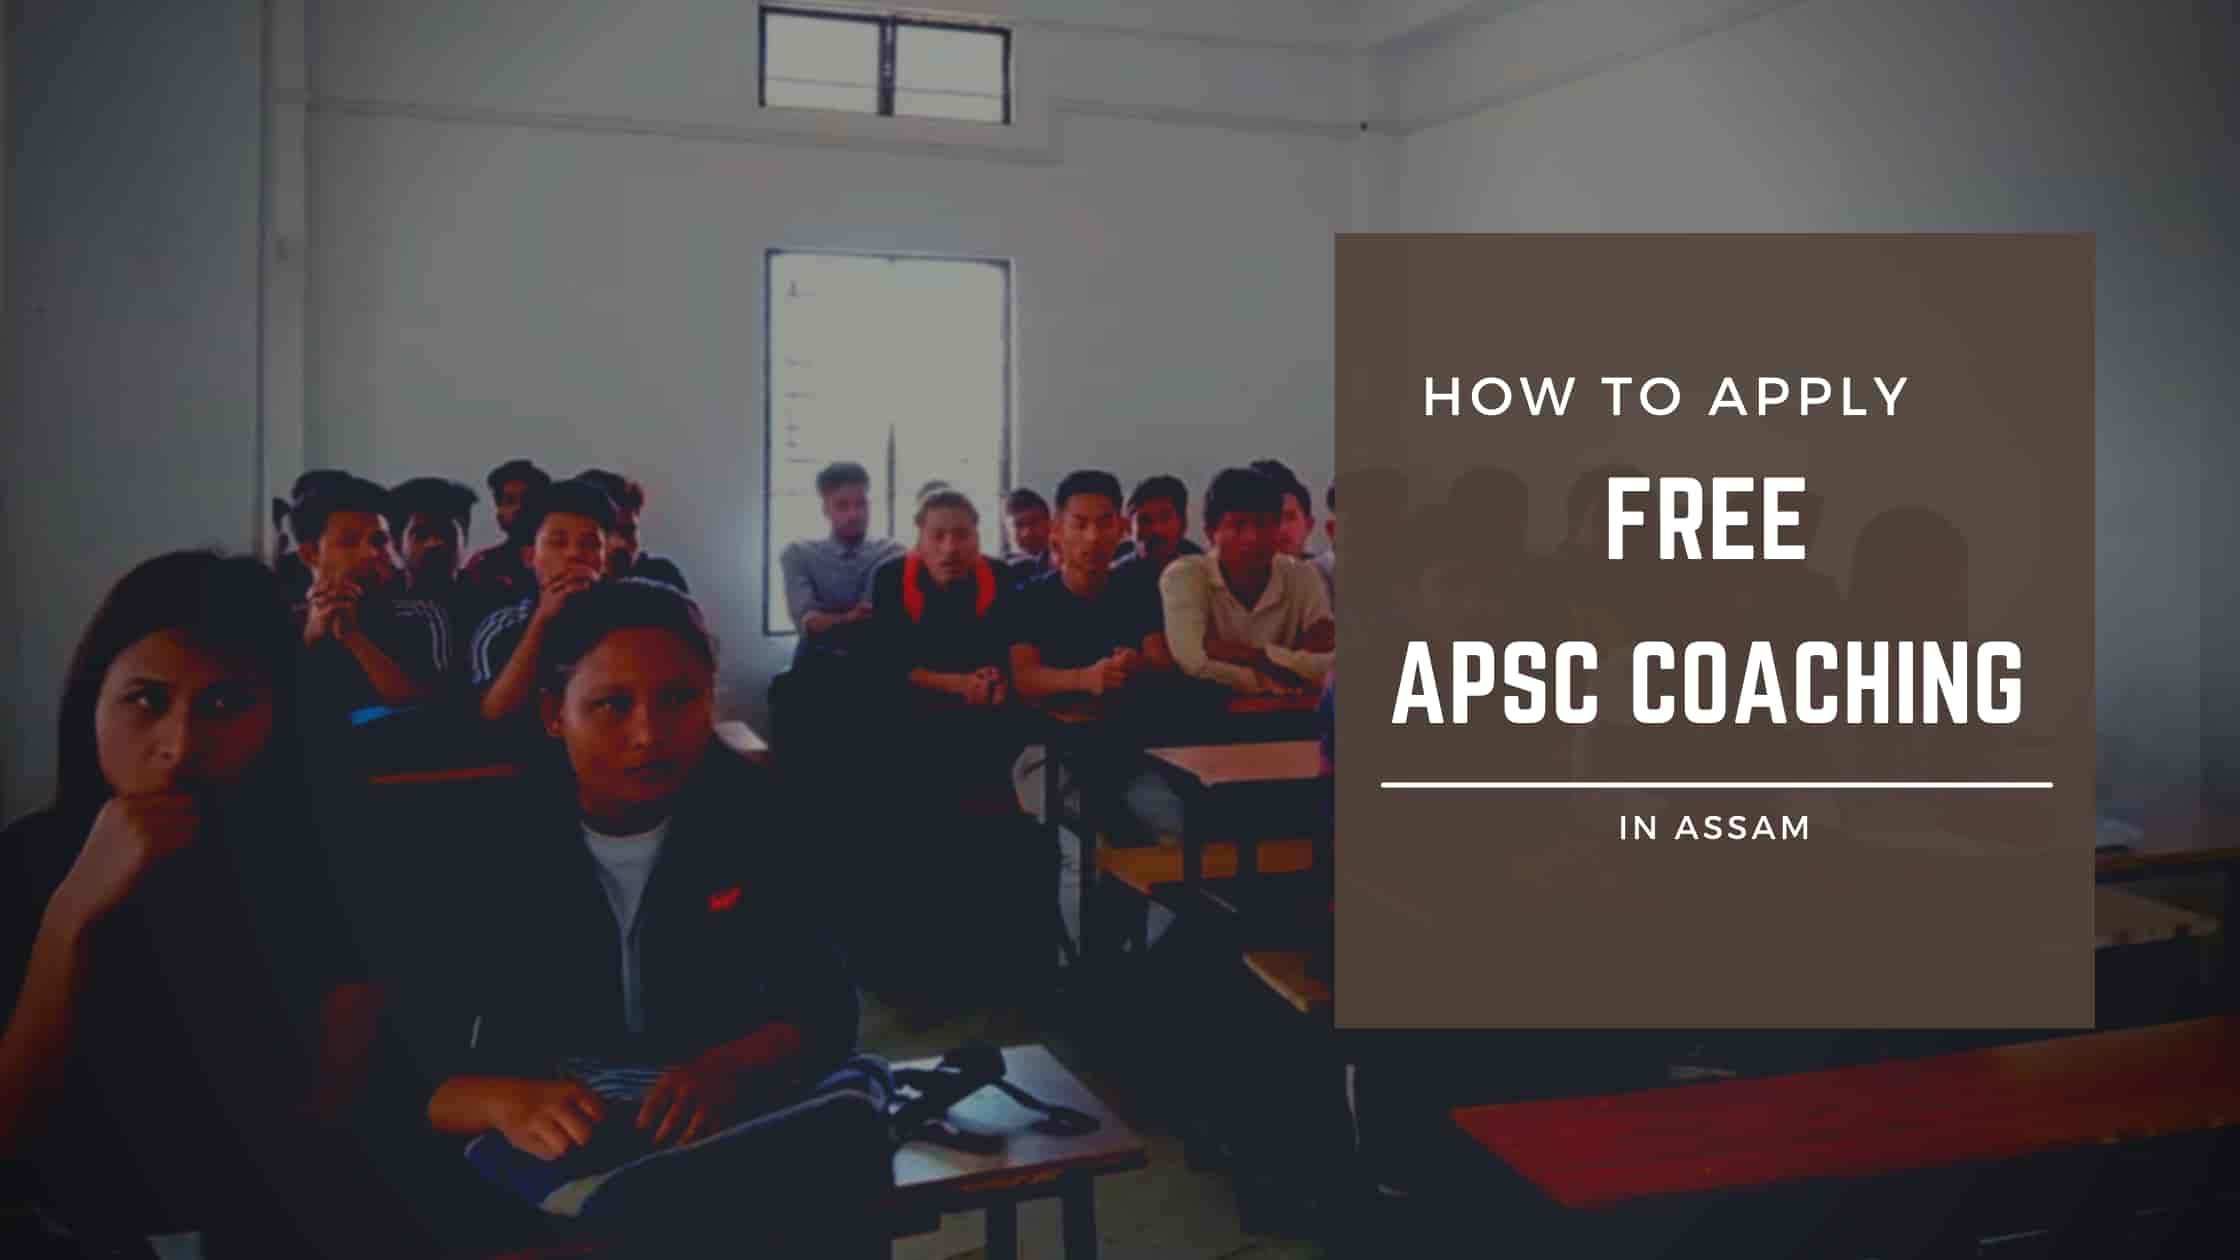 Free APSC Coaching in Assam